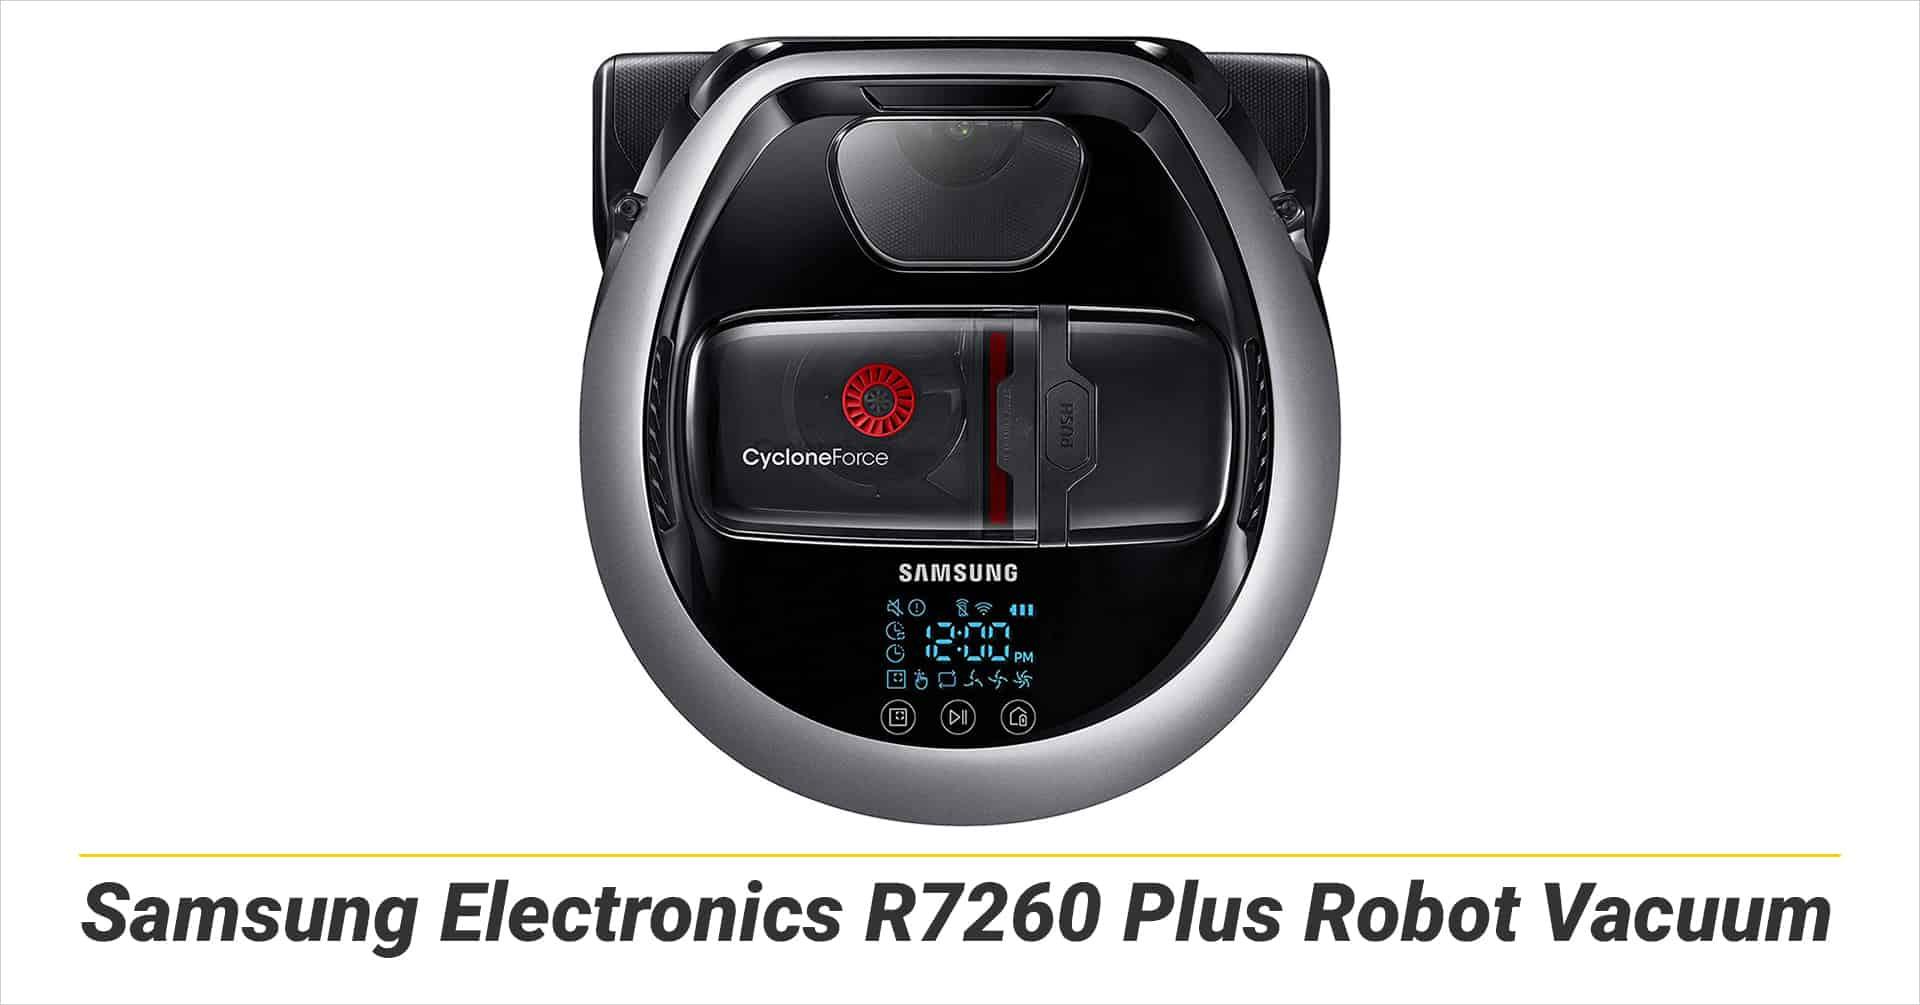 Samsung Electronics R7260 Plus Robot Vacuum